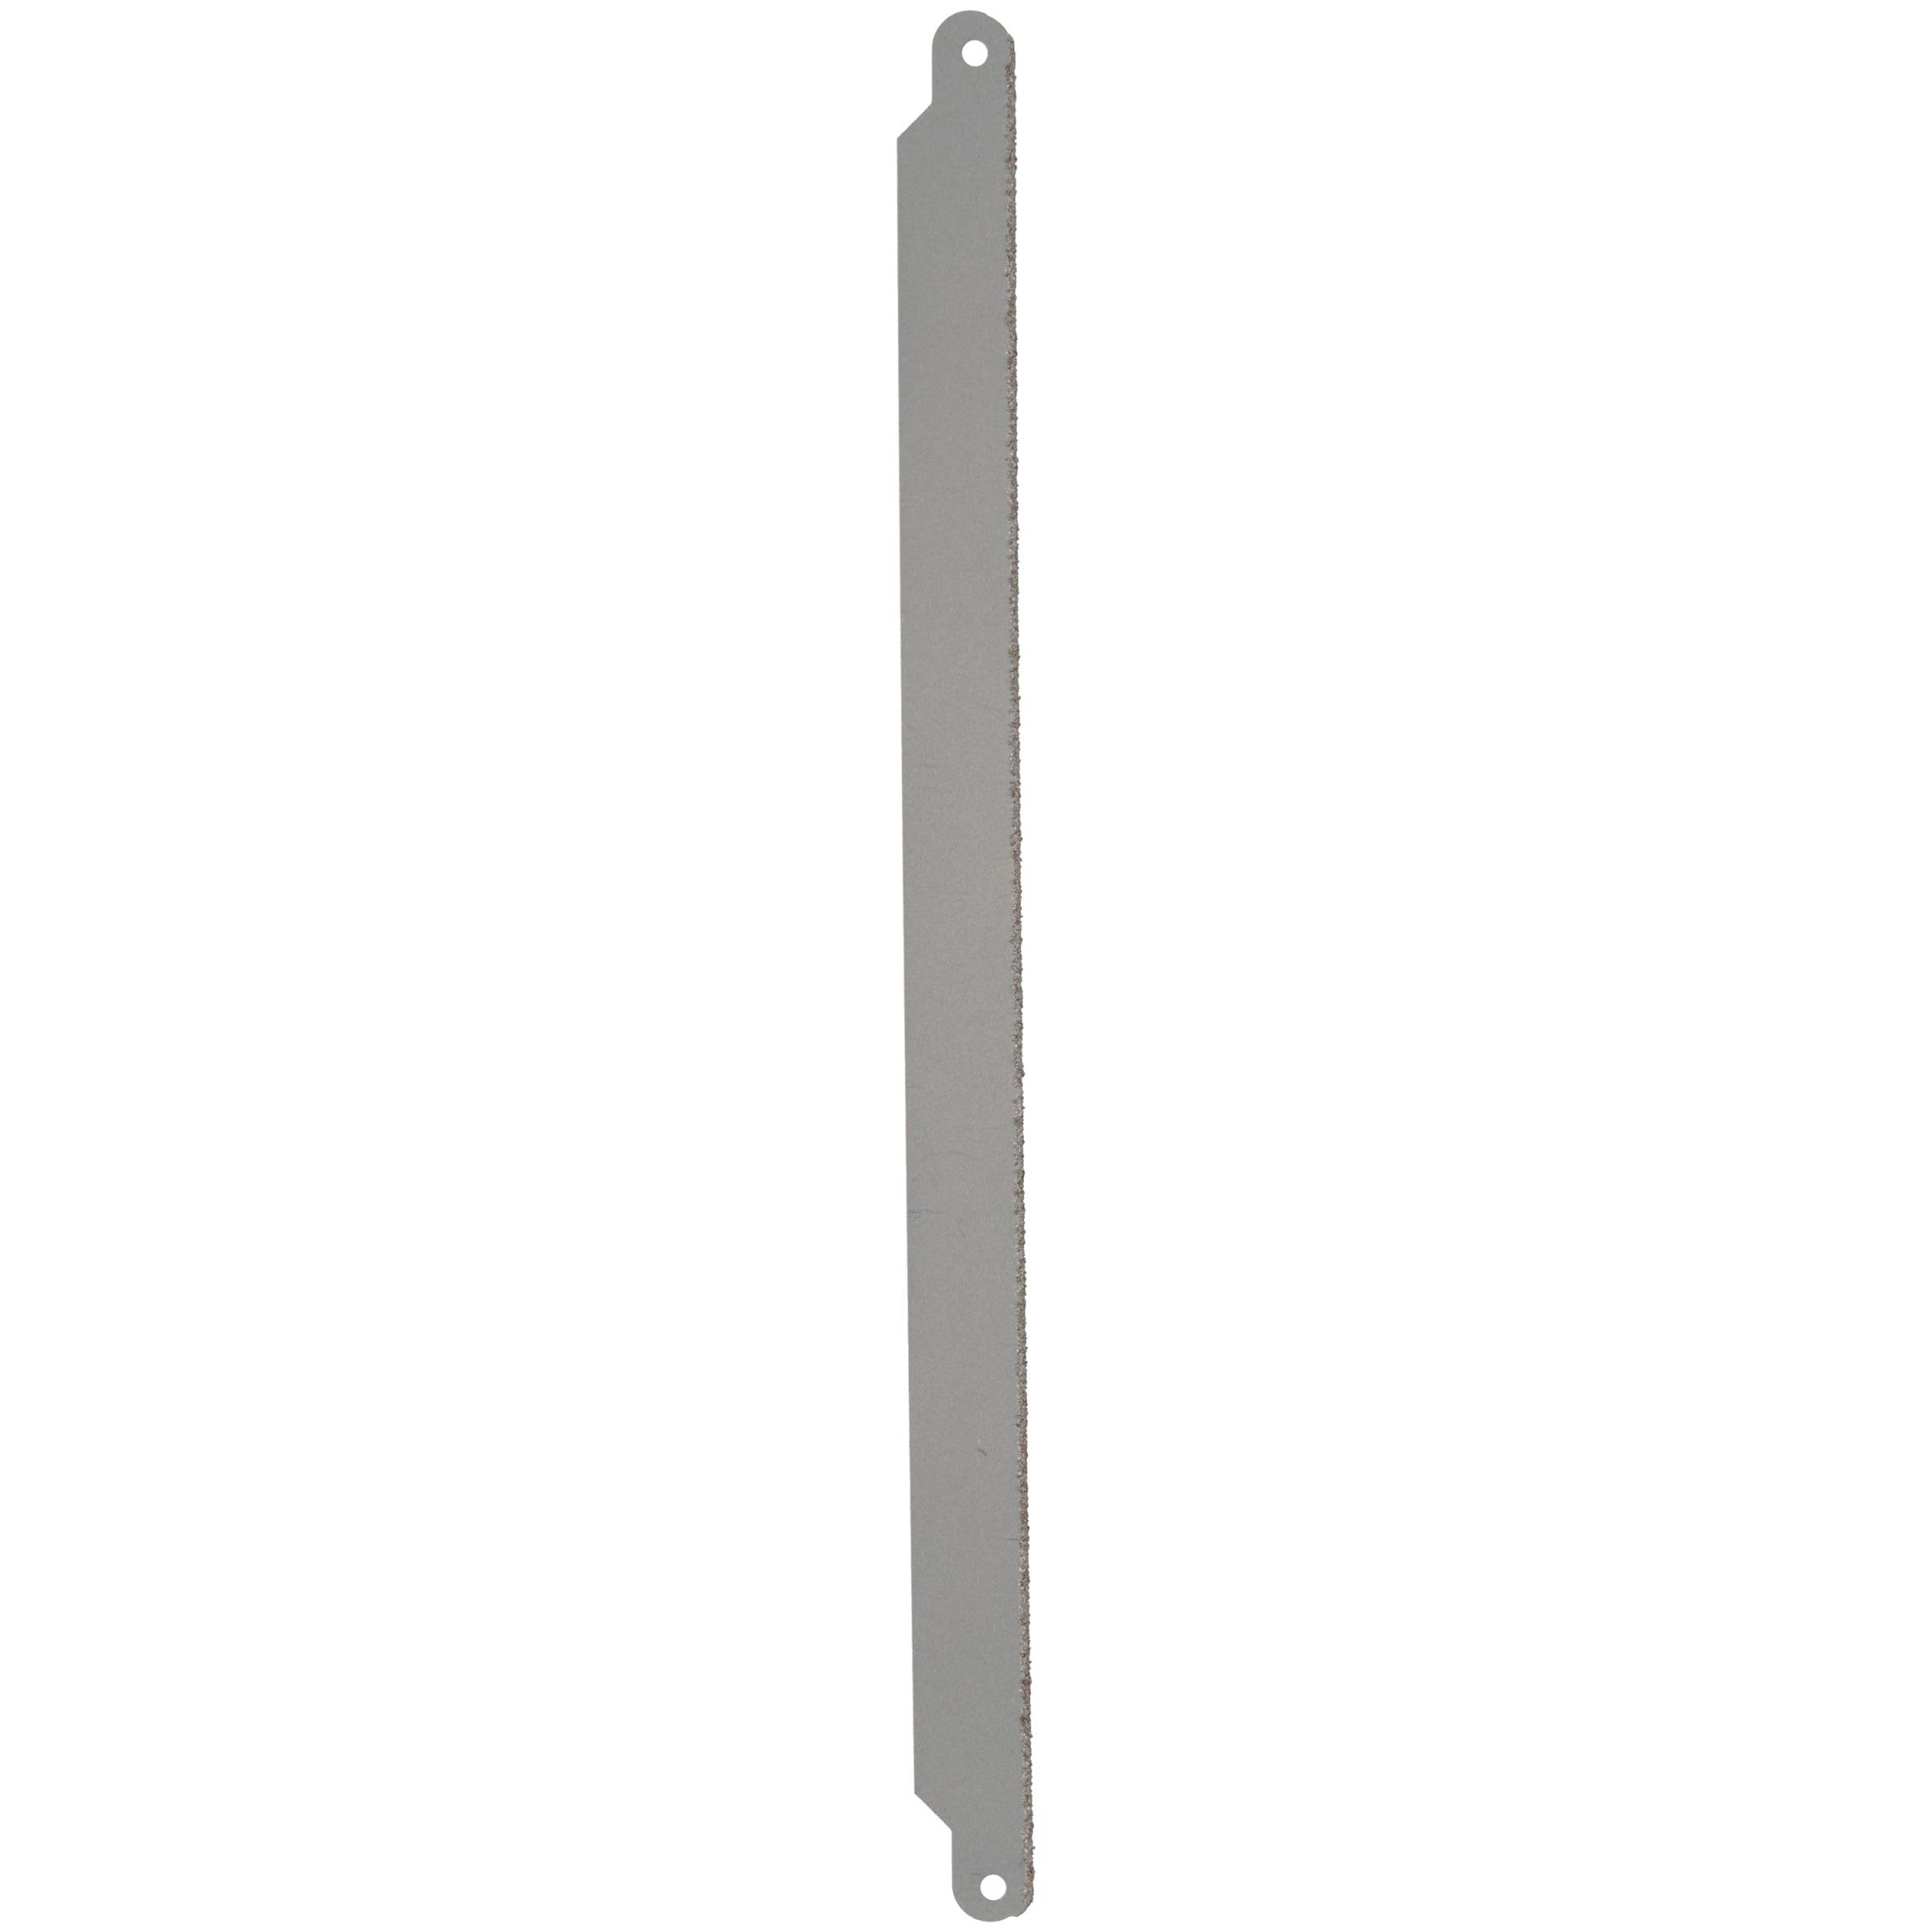 Stanley carbide grit 12 hacksaw blade walmart keyboard keysfo Gallery